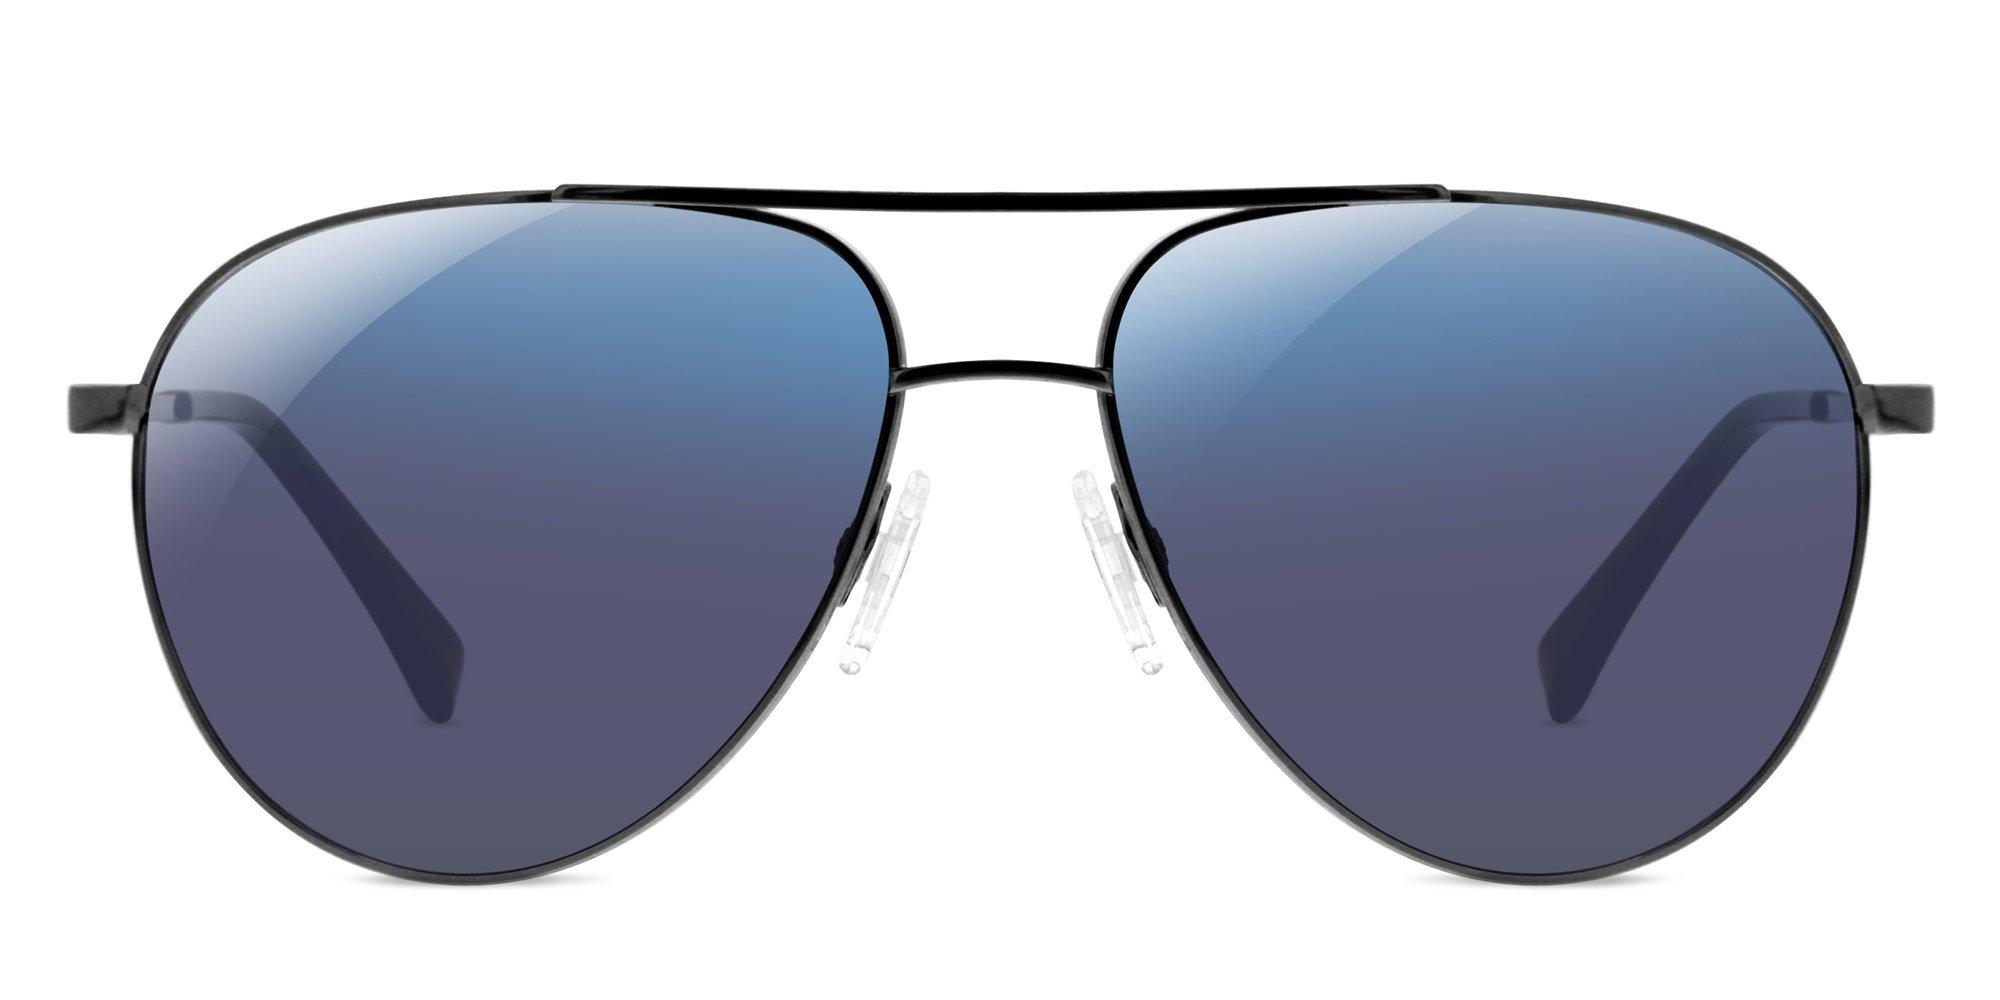 Enchroma Atlas Sunglasses - Glasses for the Color Blind (Gunmetal) by Enchroma